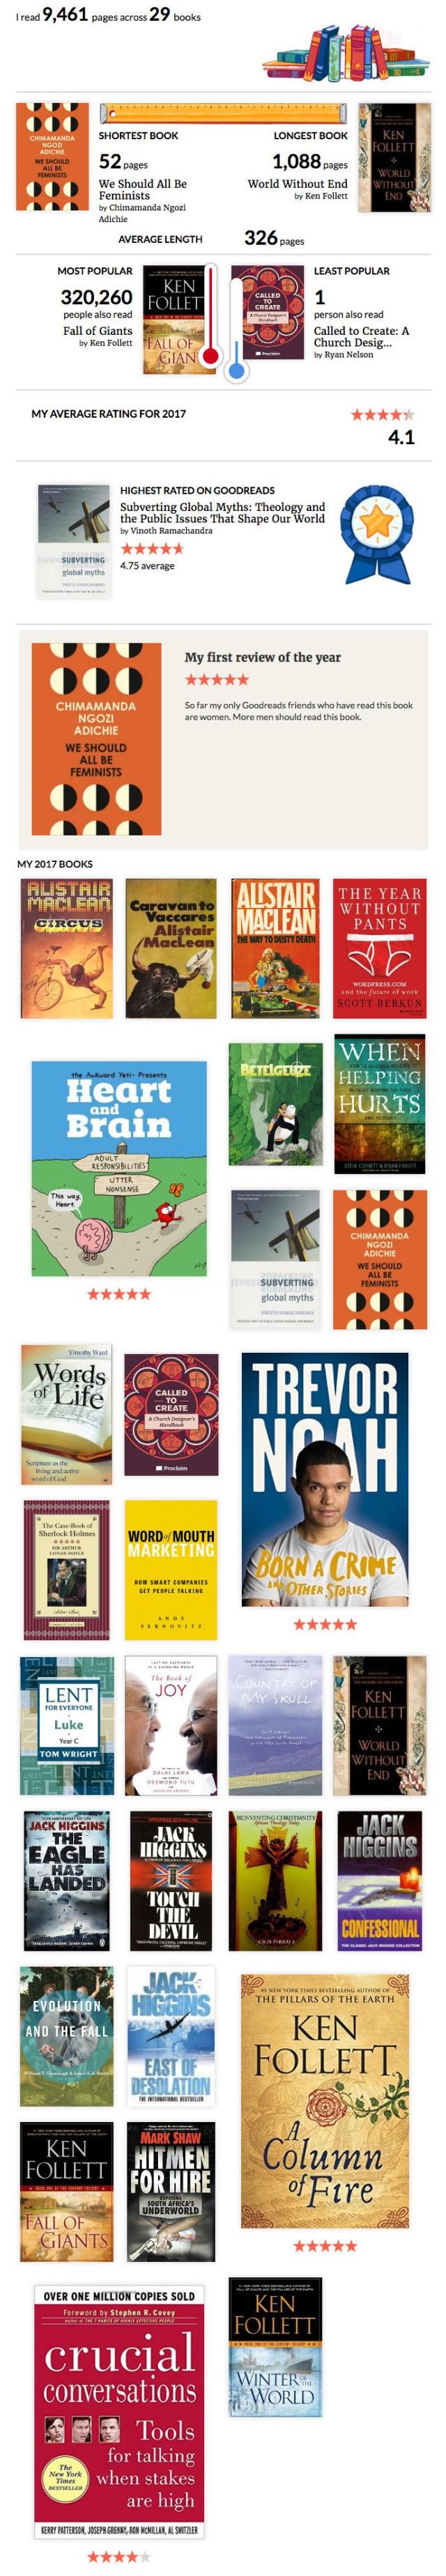 Screenshot-2018-1-13 Goodreads 2017 Year in Books.jpg